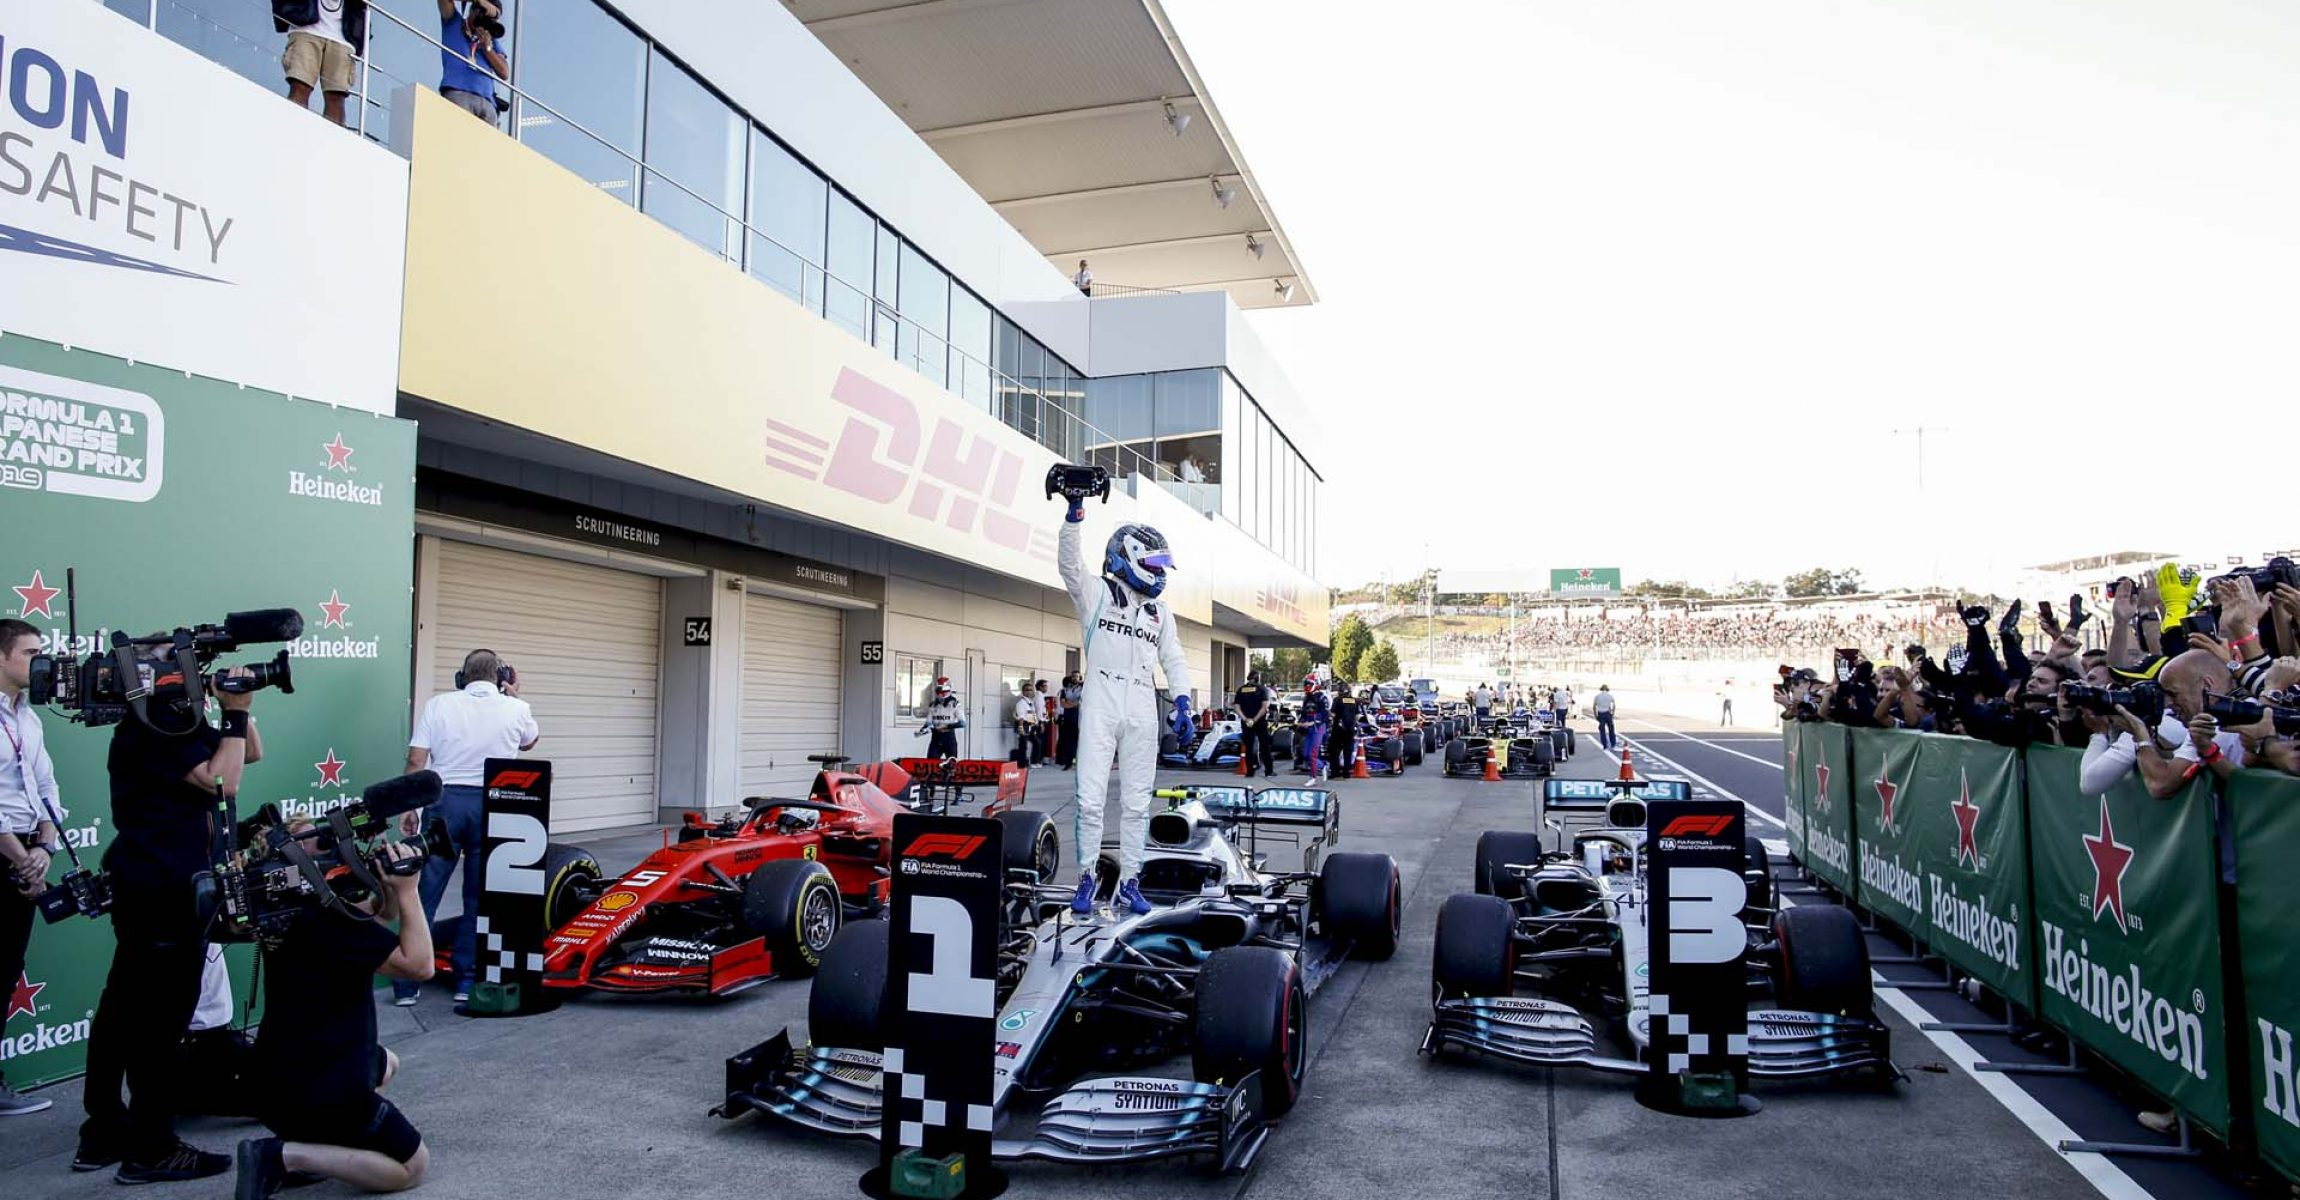 2019 Japanese Grand Prix, Sunday - Wolfgang Wilhelm Valtteri Bottas, Mercedes